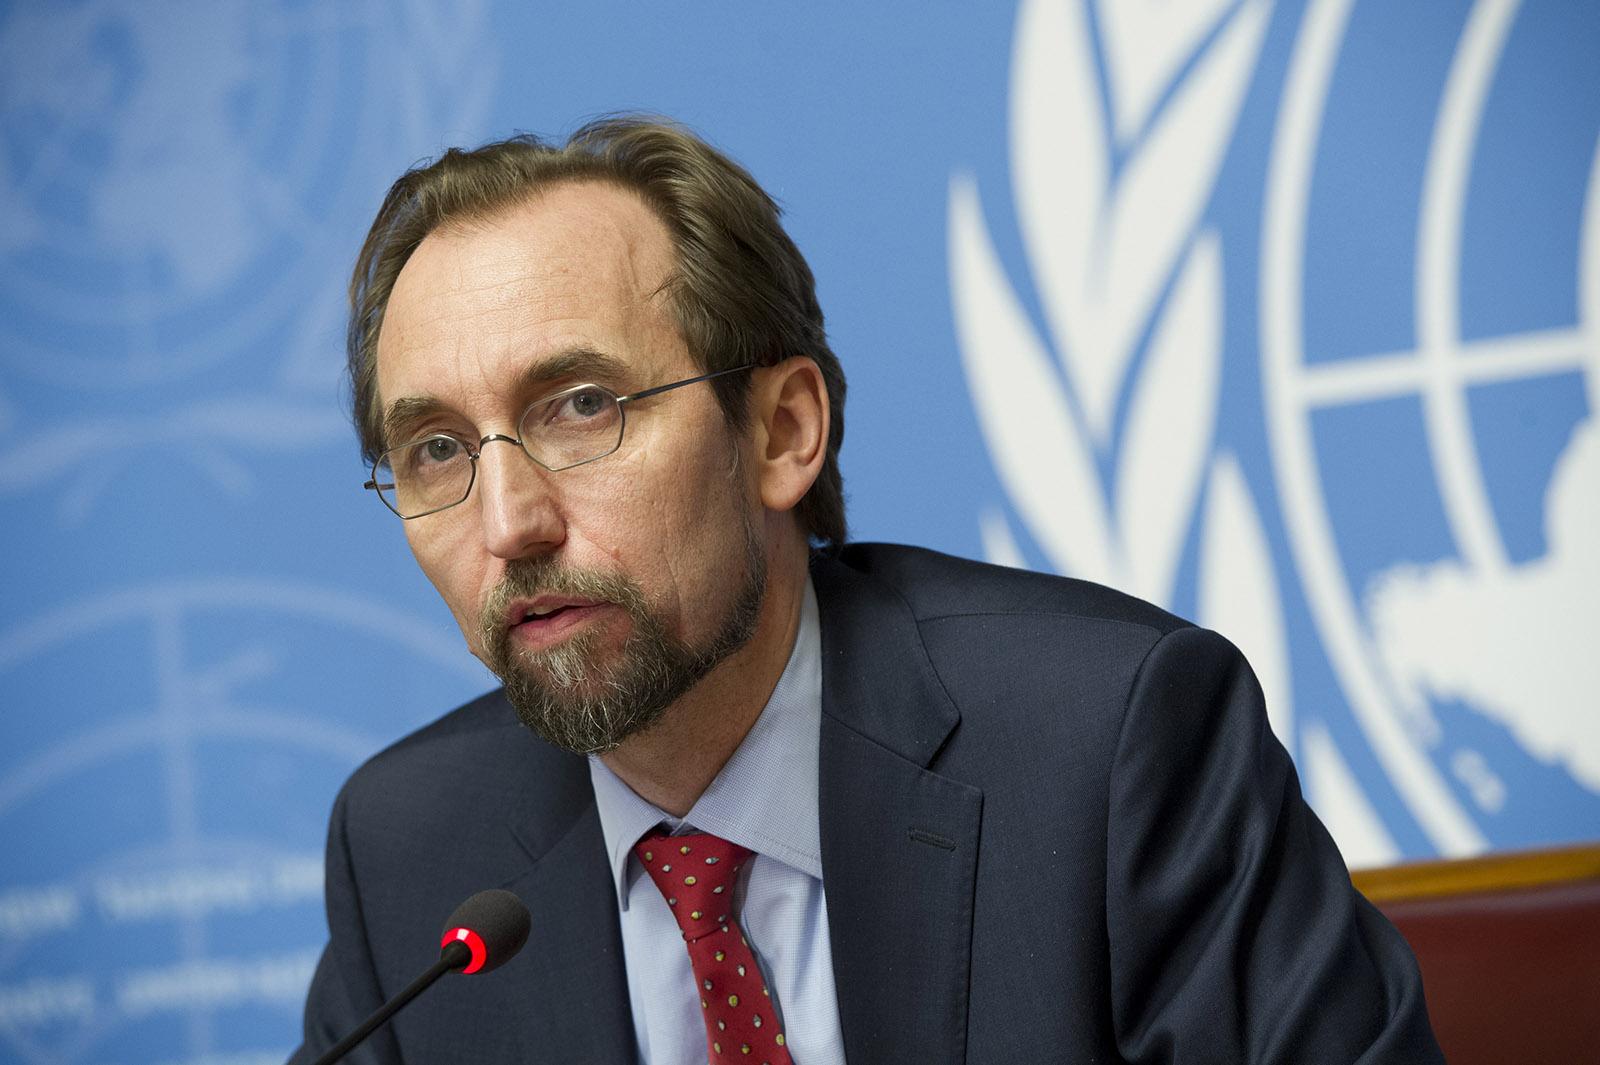 High Commissioner Zeid Ra'ad al-Hussein. Photo: UN Photo/Violaine Martin